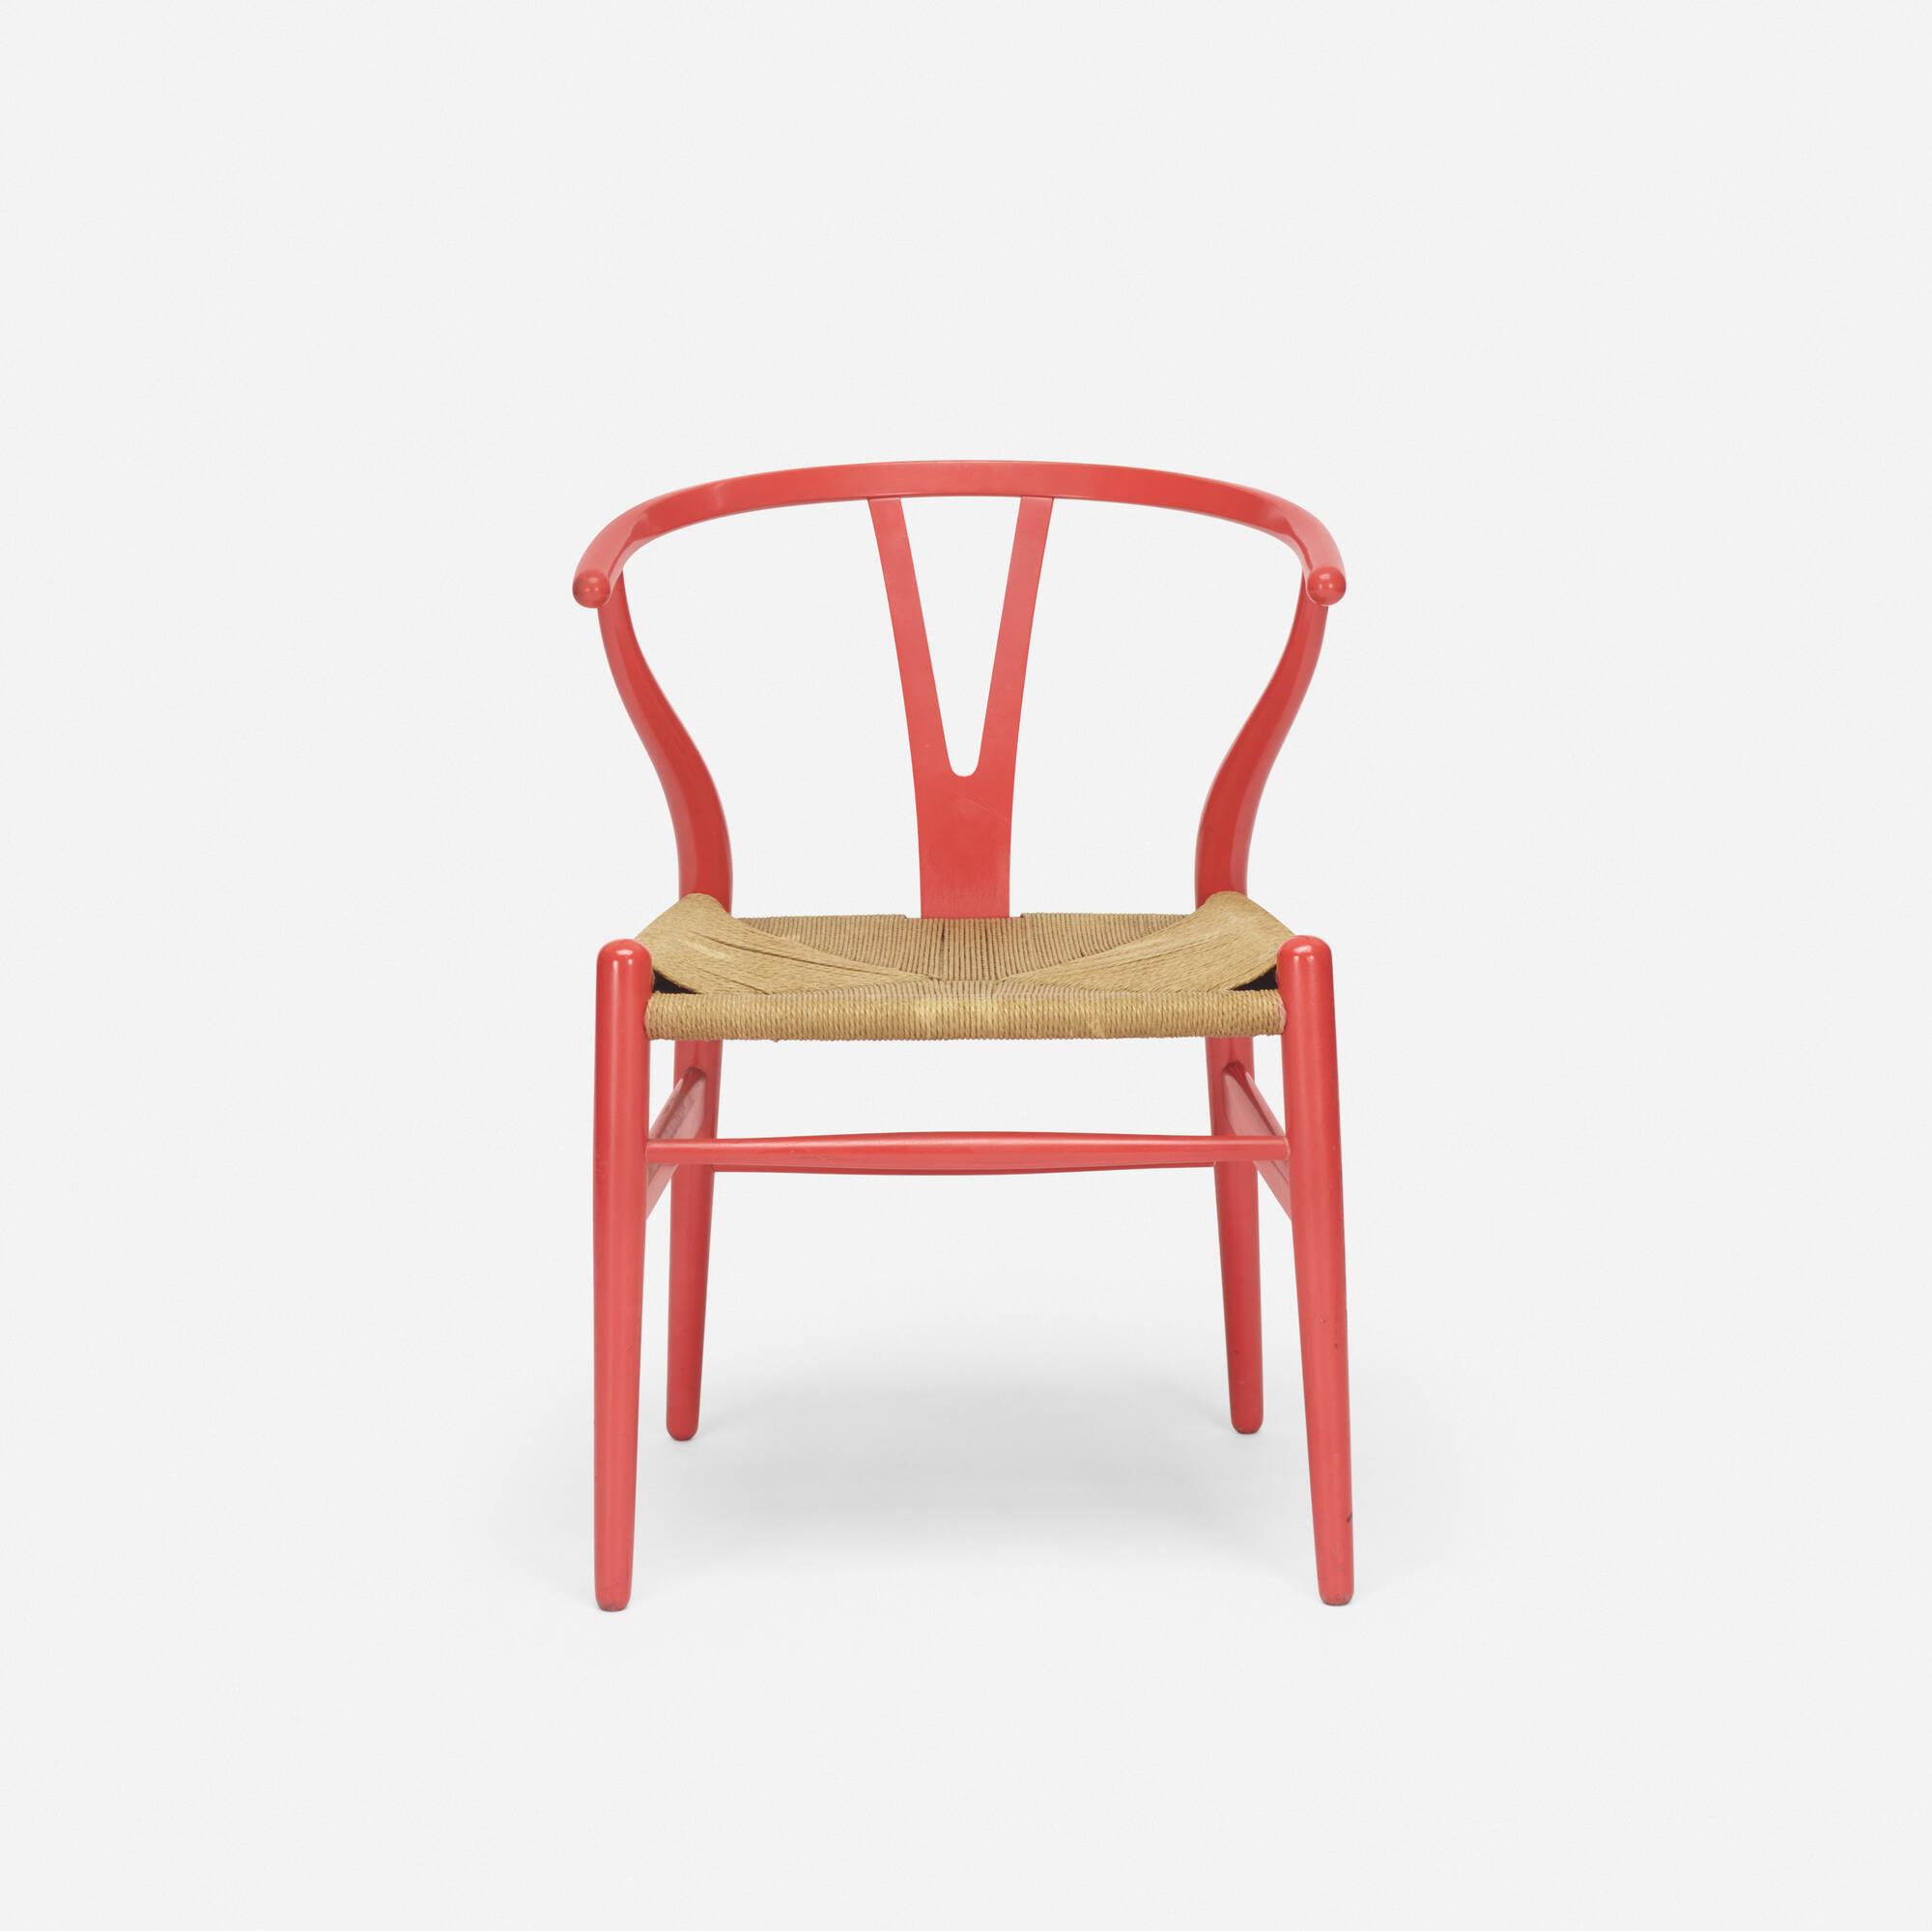 693 Hans J Wegner Wishbone chair model CH24 Mass Modern Day